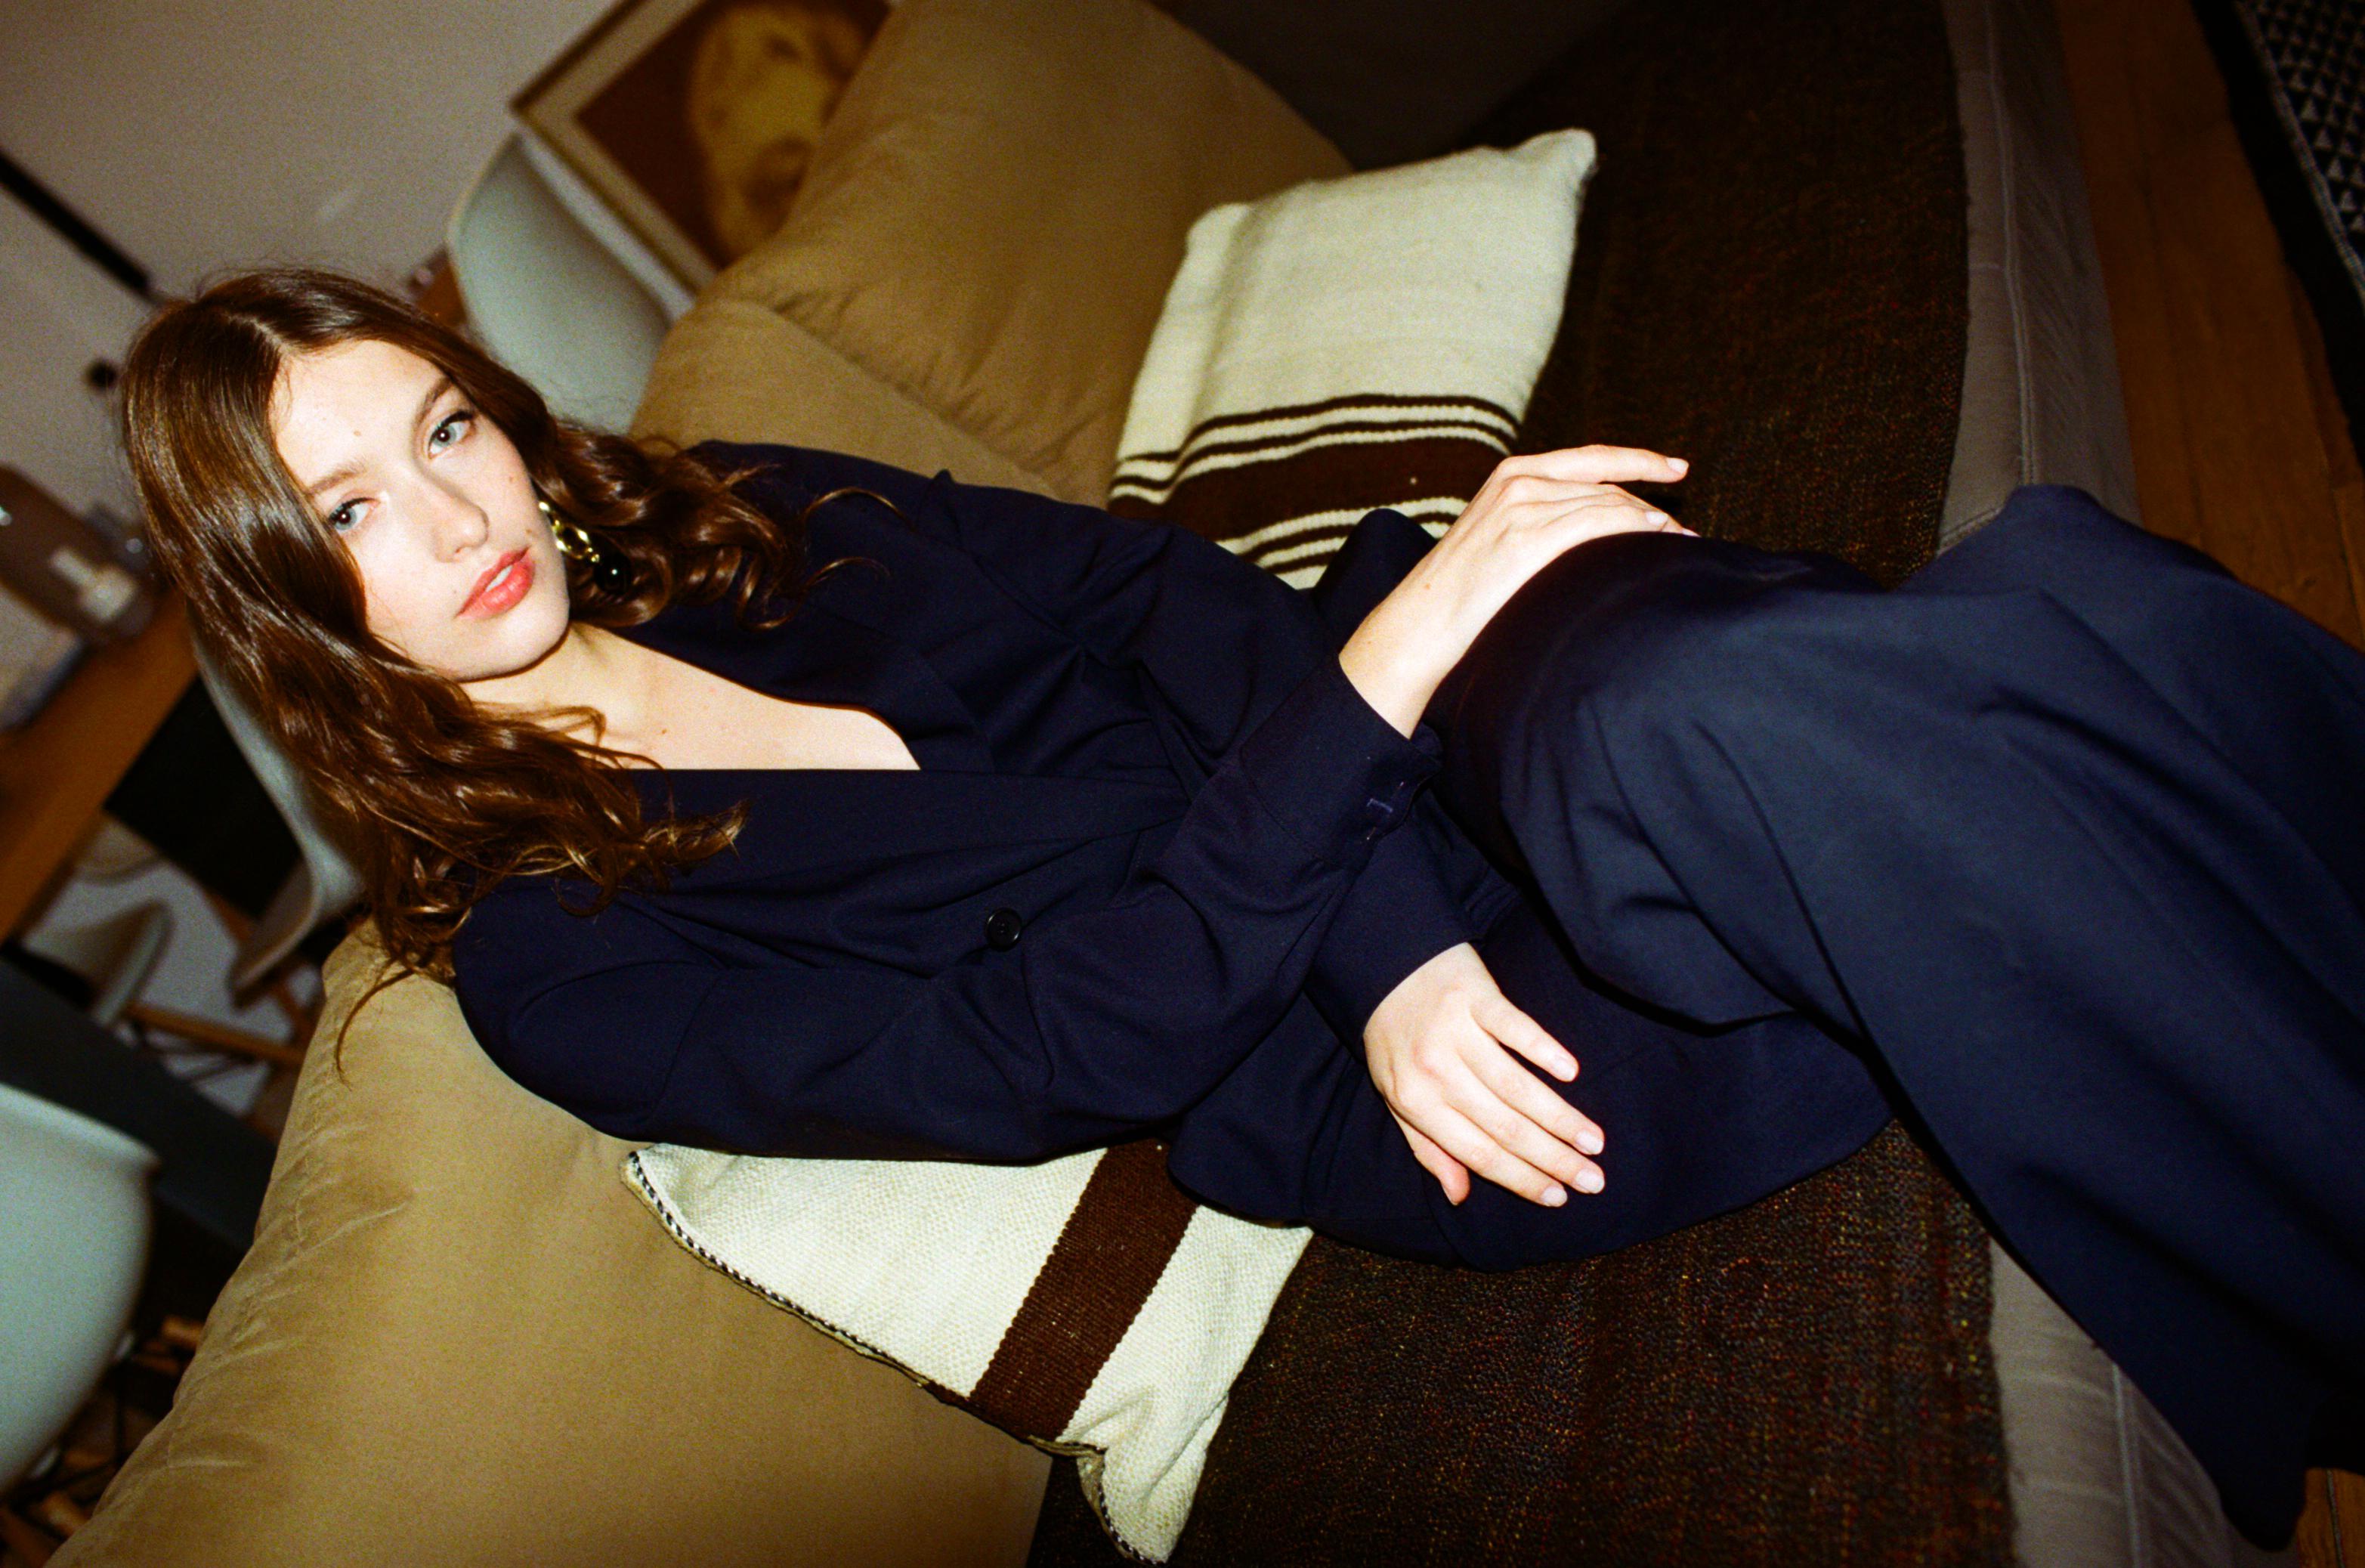 Nathalie Dumeix 35